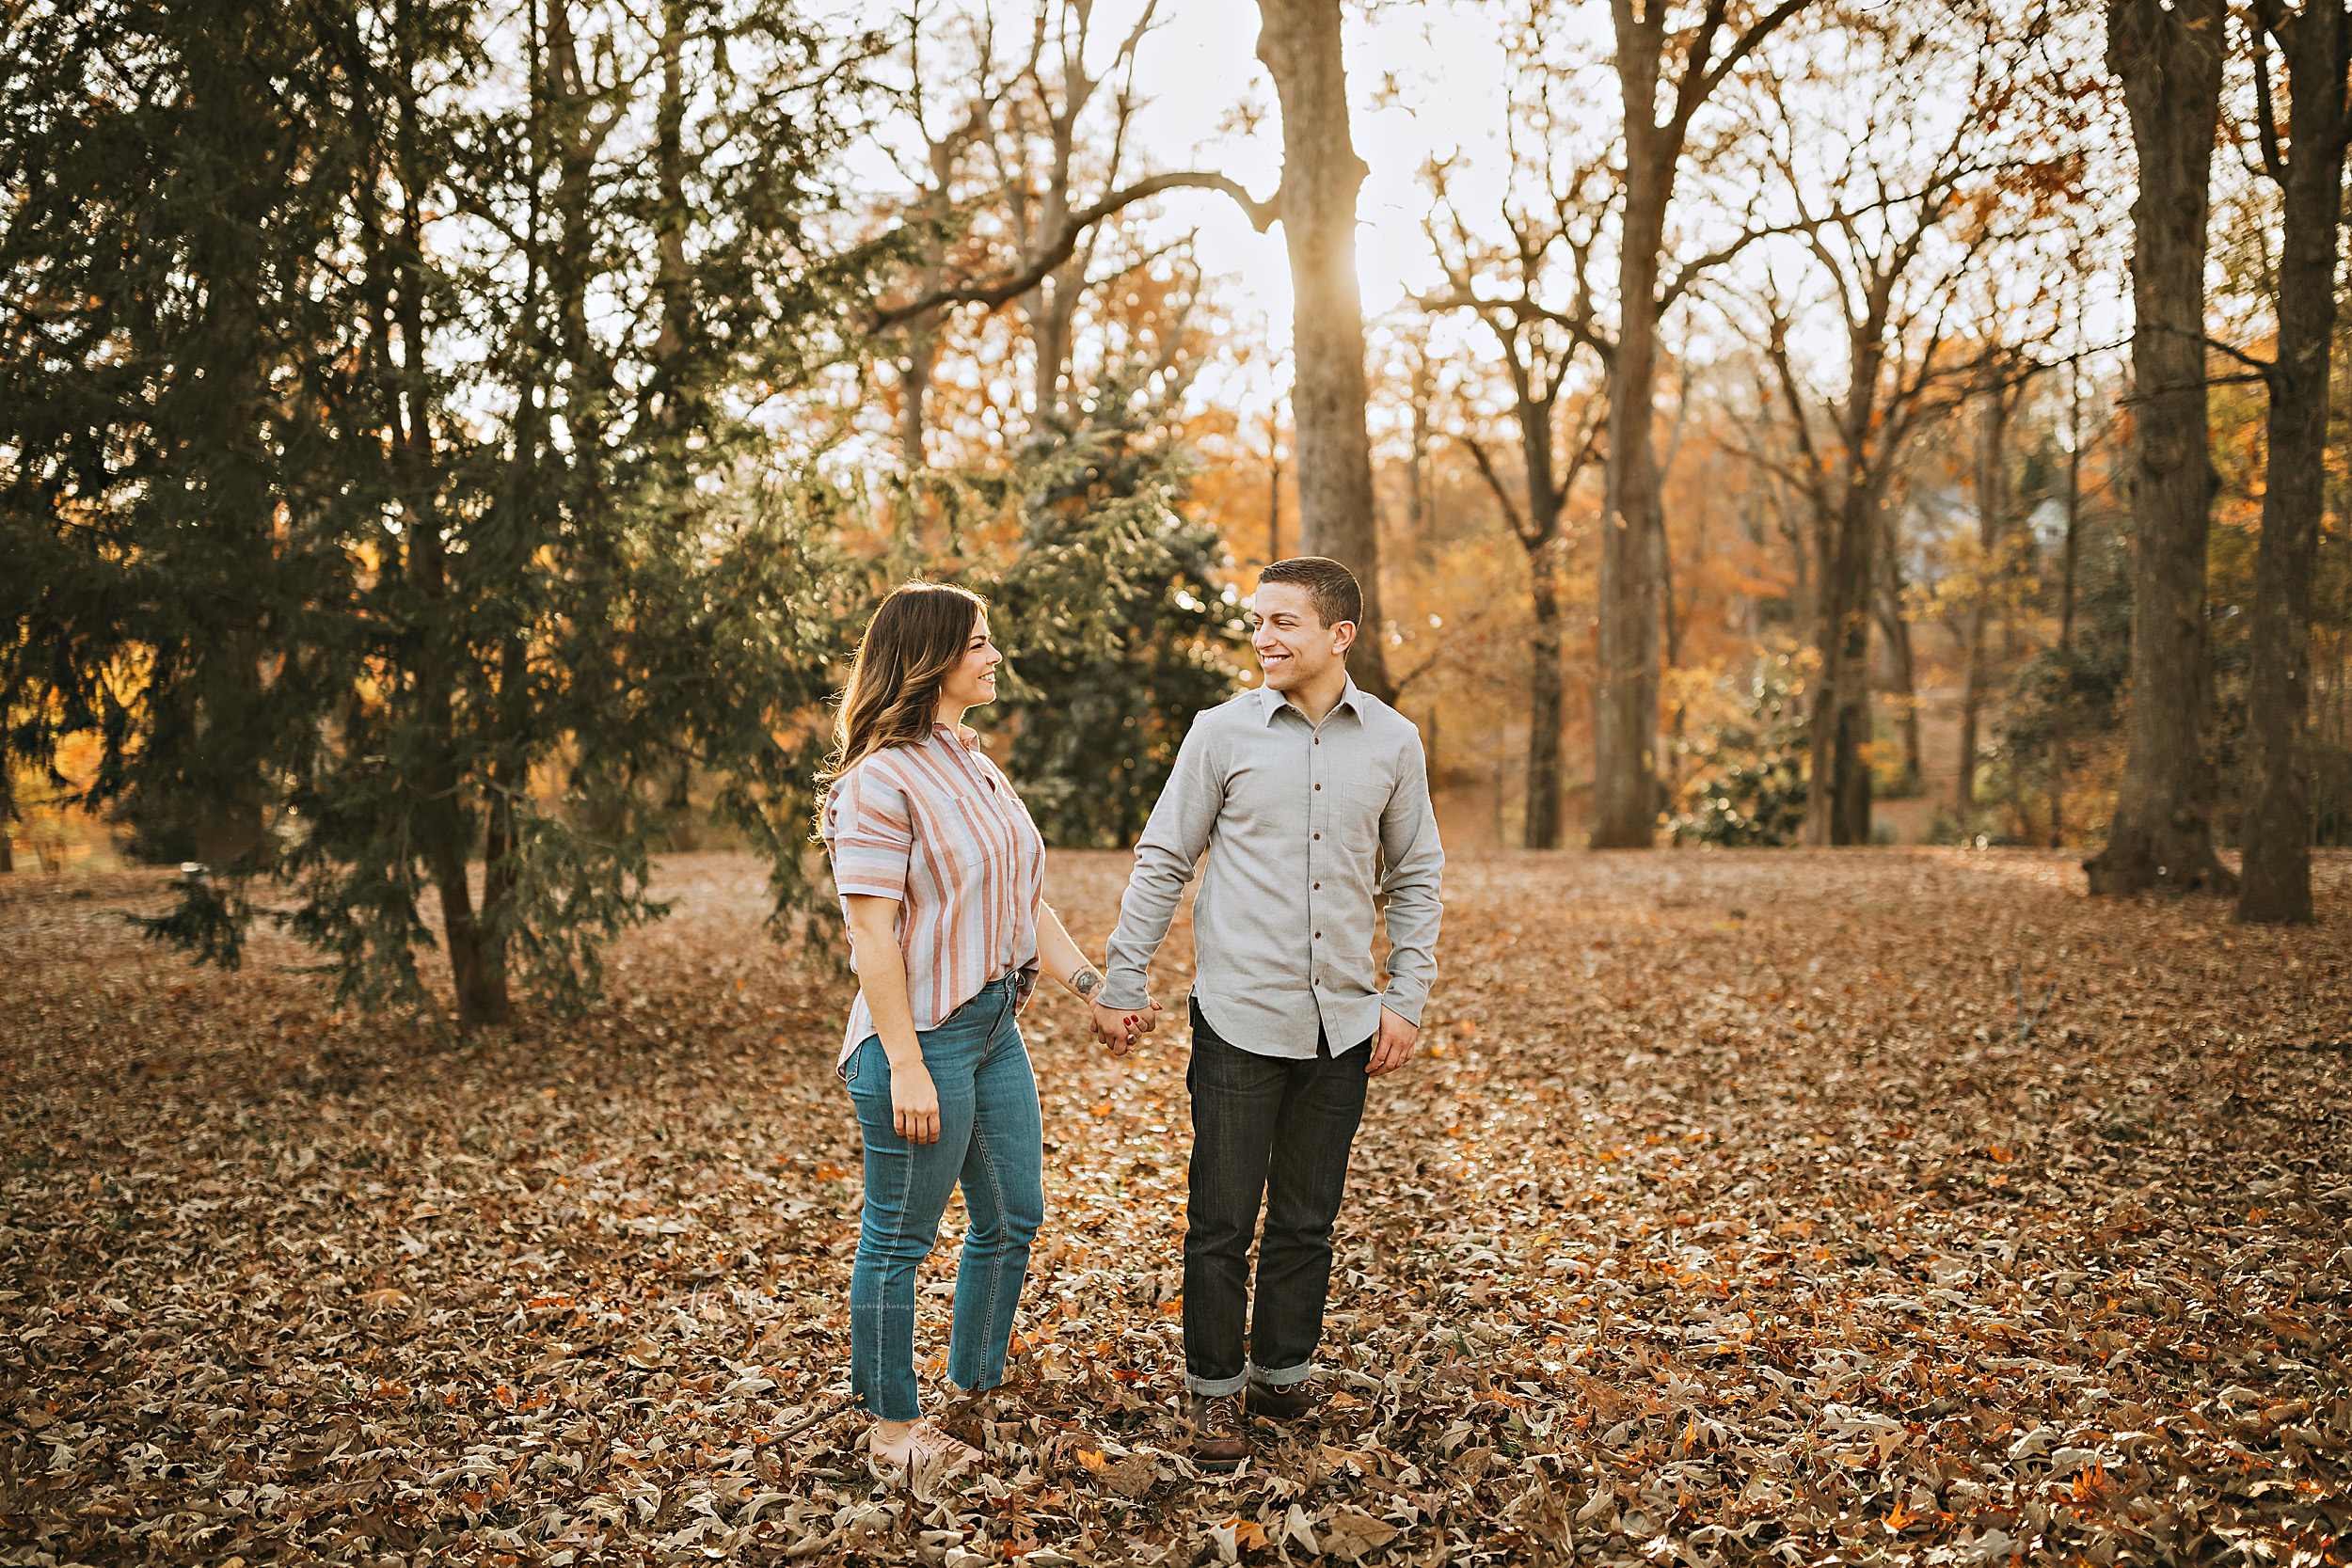 atlanta-reynoldstown-peoplestown-decatur-sandy-springs-buckhead-virginia-highlands-west-end-decatur-lily-sophia-photography-outdoor-fall-couples-photos_1474.jpg